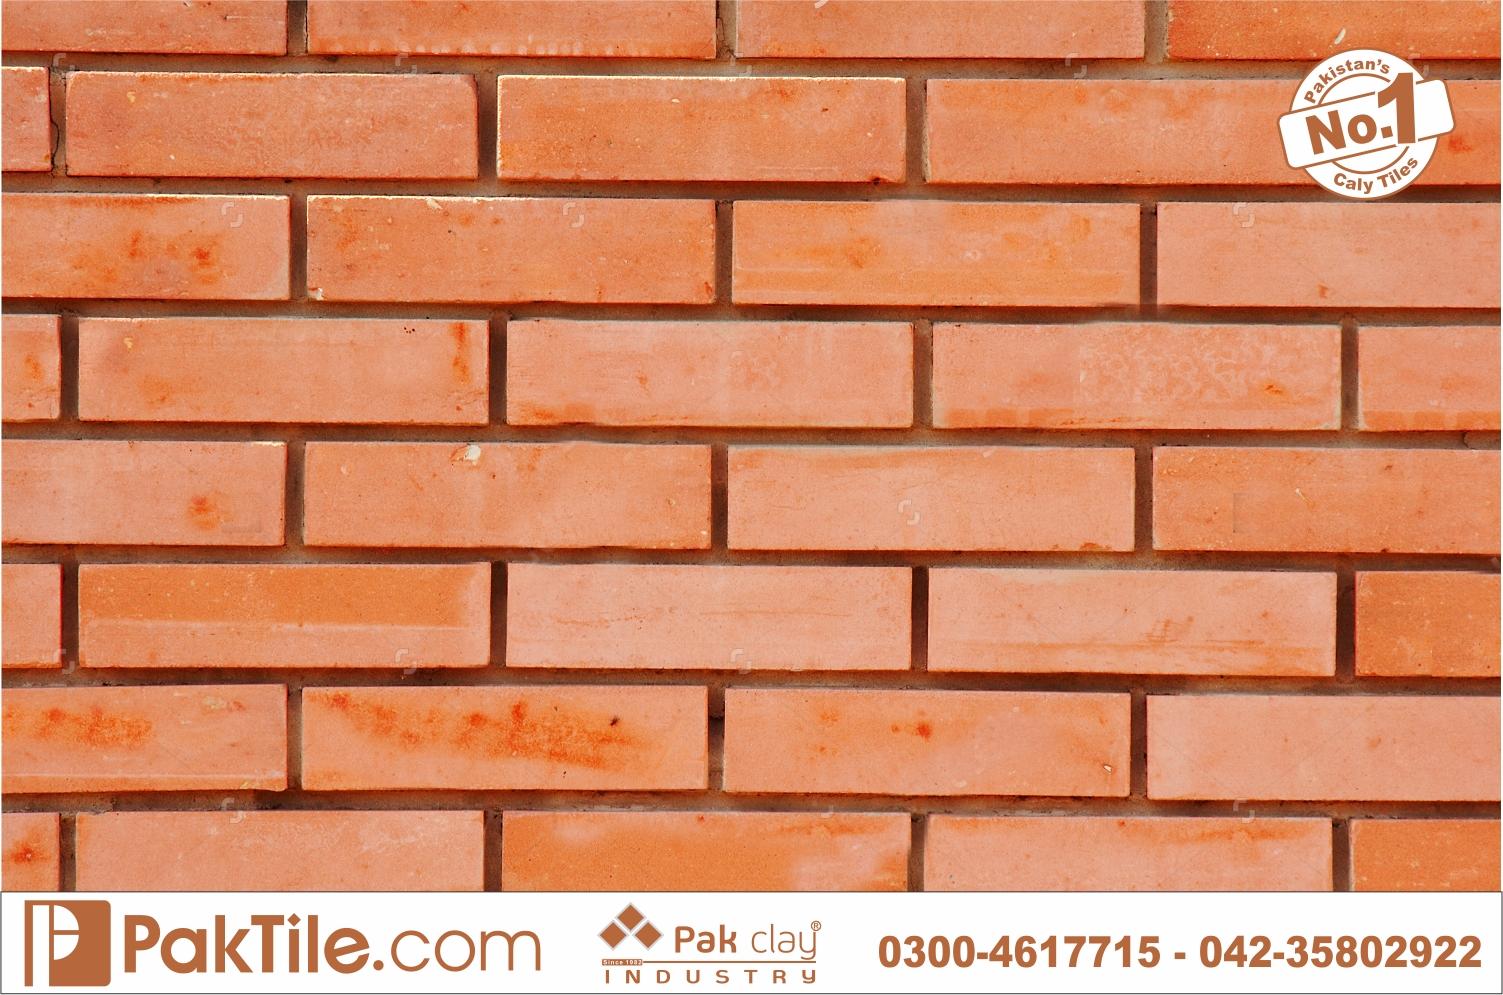 17 Pak Clay brick tiles textures brick tiles pattern brick tiles rates images